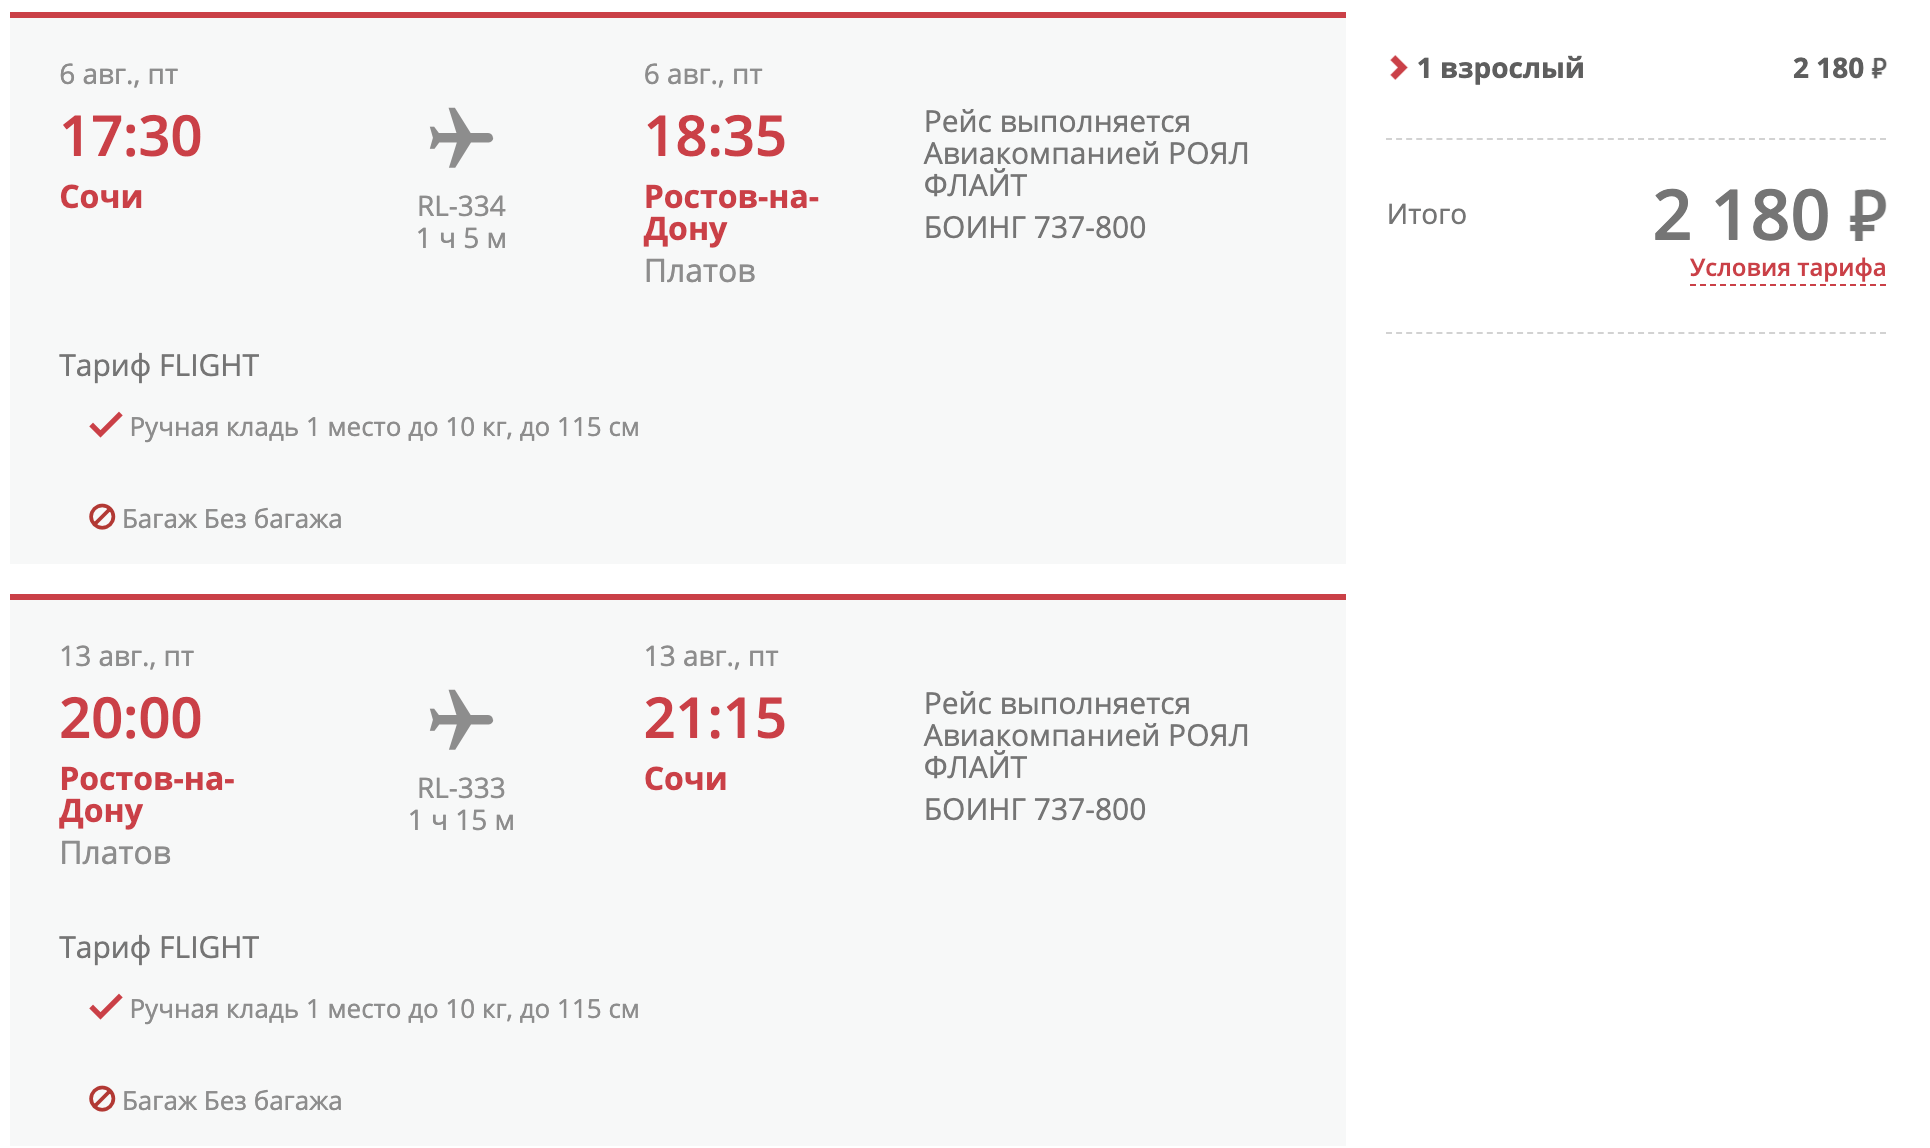 Все лето! Летаем из Ростова-на-Дону в Сочи и наоборот за 2200₽ туда-обратно